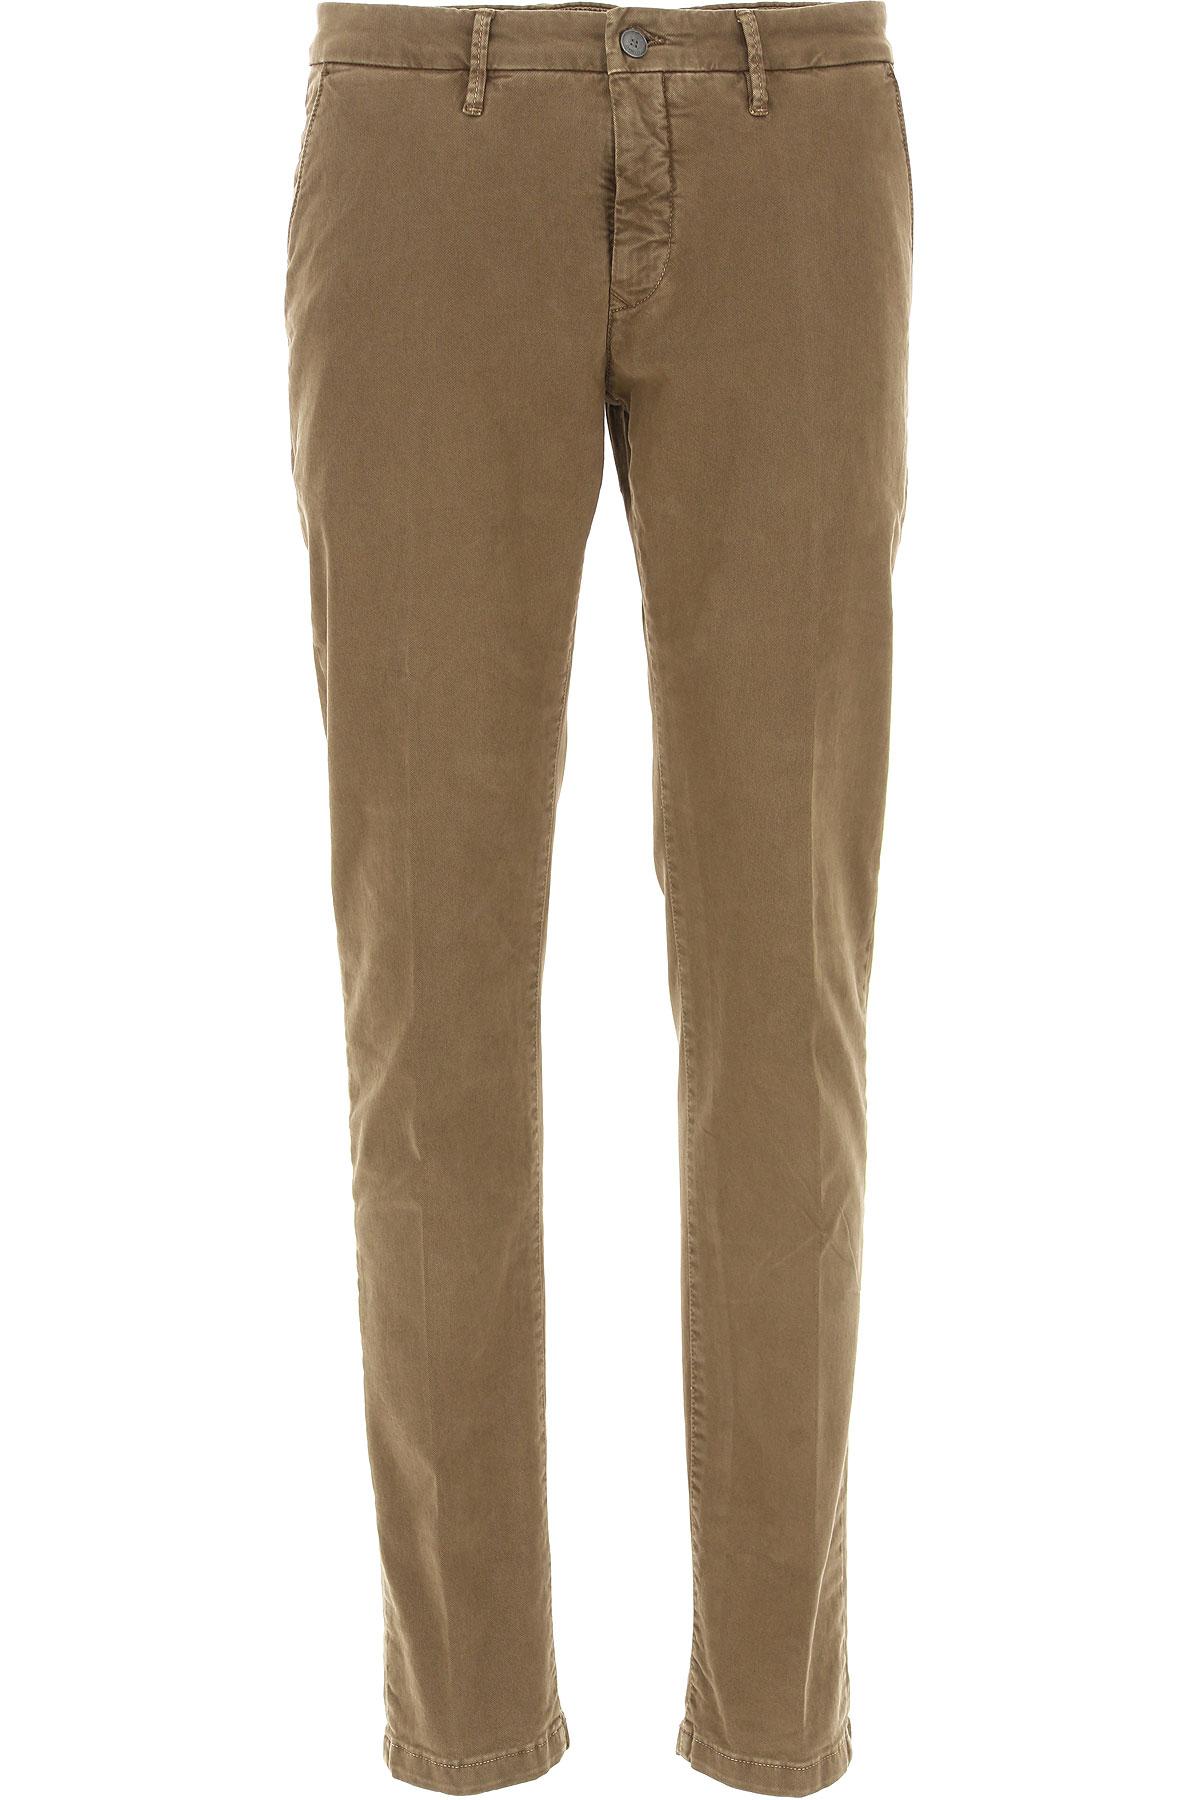 Image of Siviglia Pants for Men, Brown, Cotton, 2017, 32 33 34 35 36